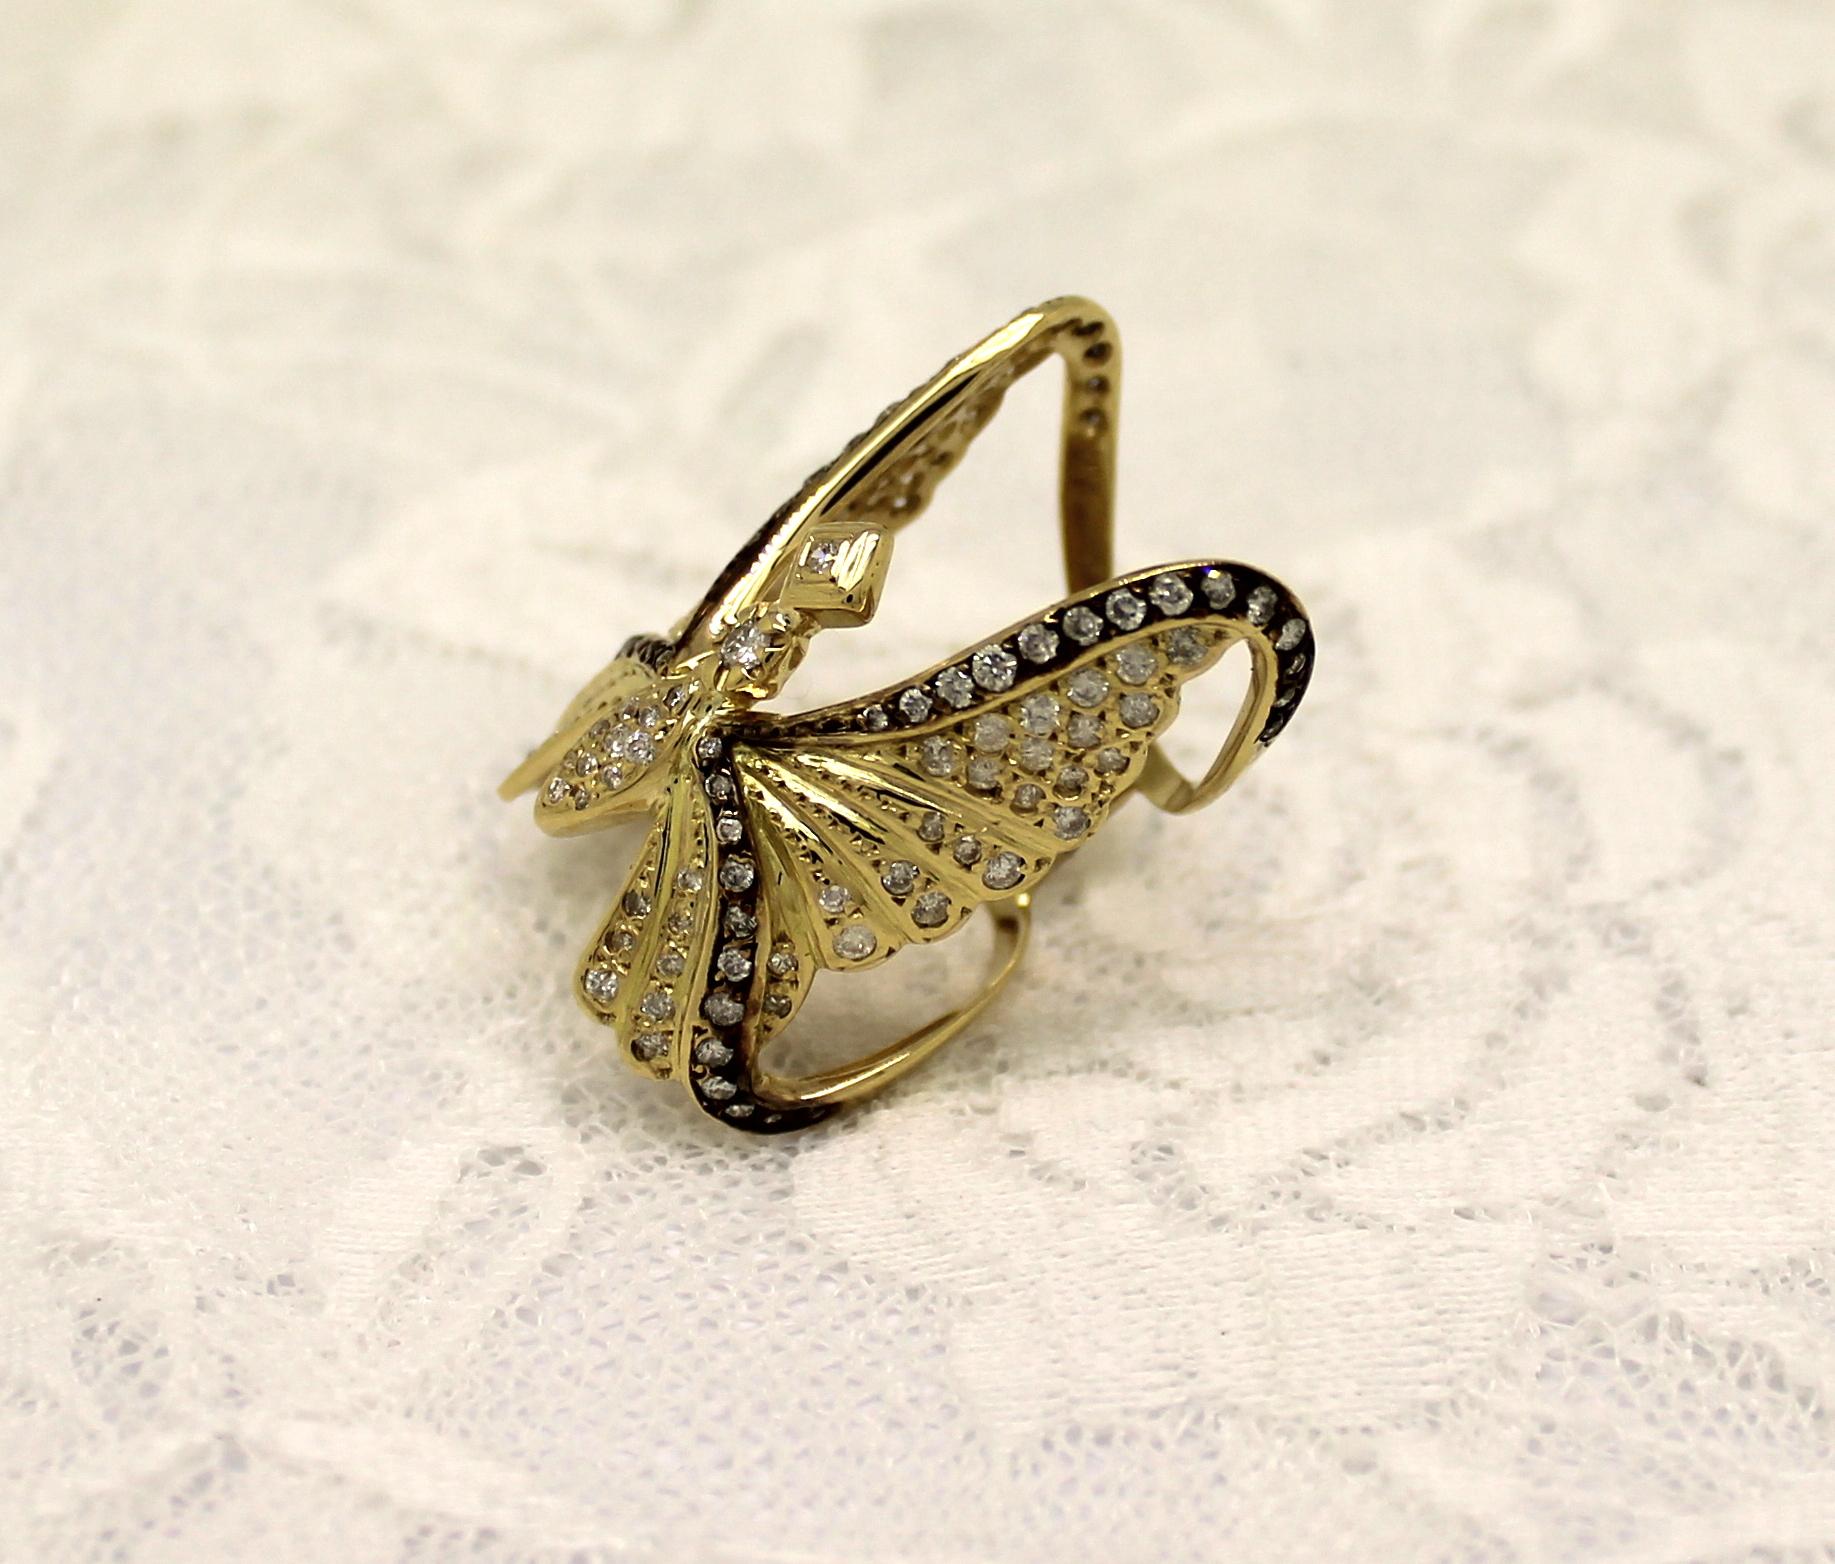 Anel Borboleta 1,75cts de Diamante Ouro Amarelo com rodium negro 126858c5e1